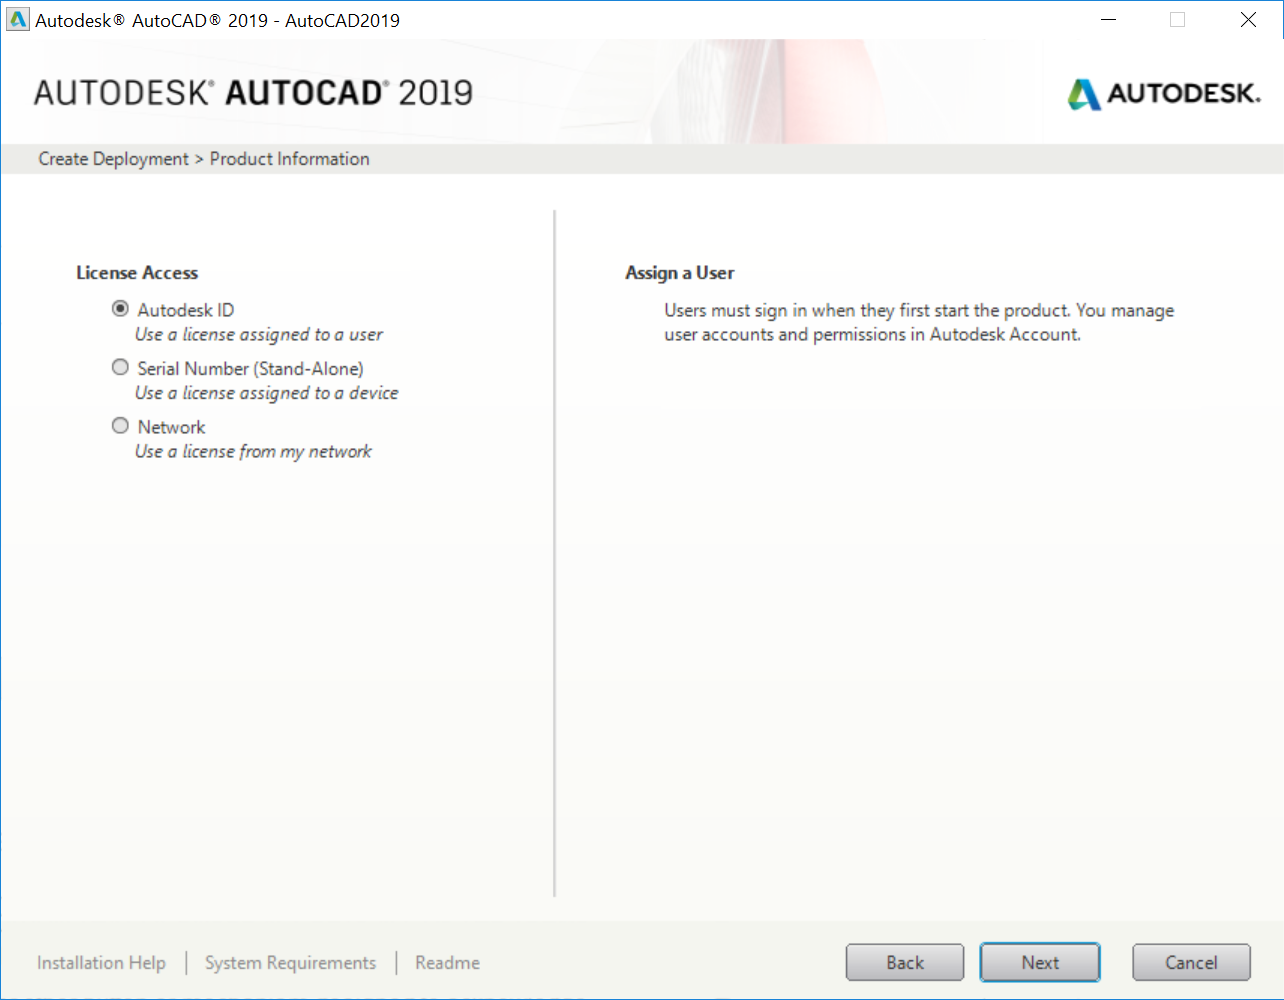 autocad2019-5